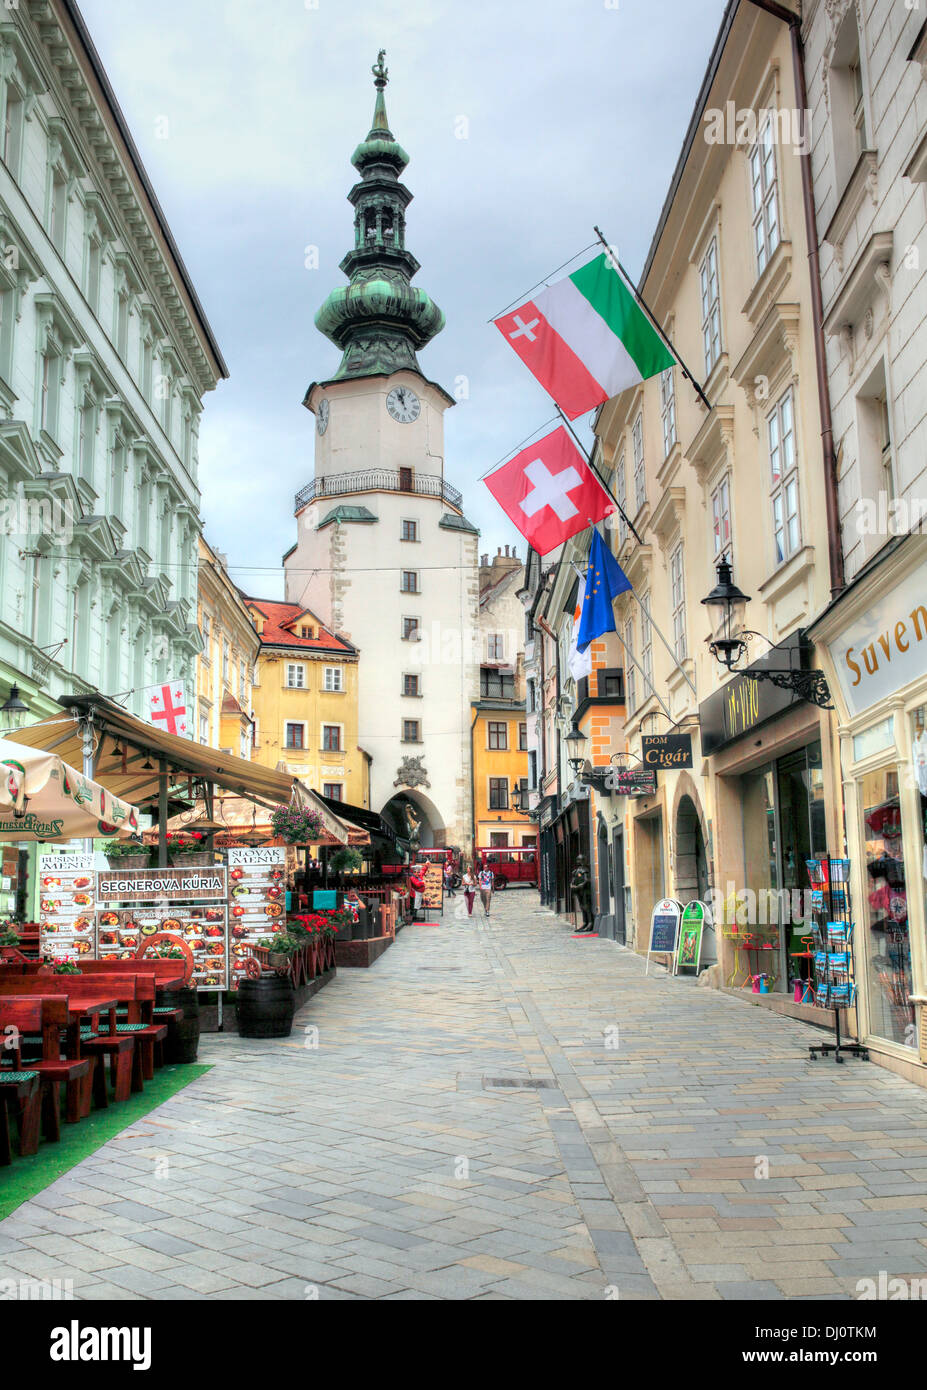 St. Michael Gate, Bratislava, Slovakia - Stock Image